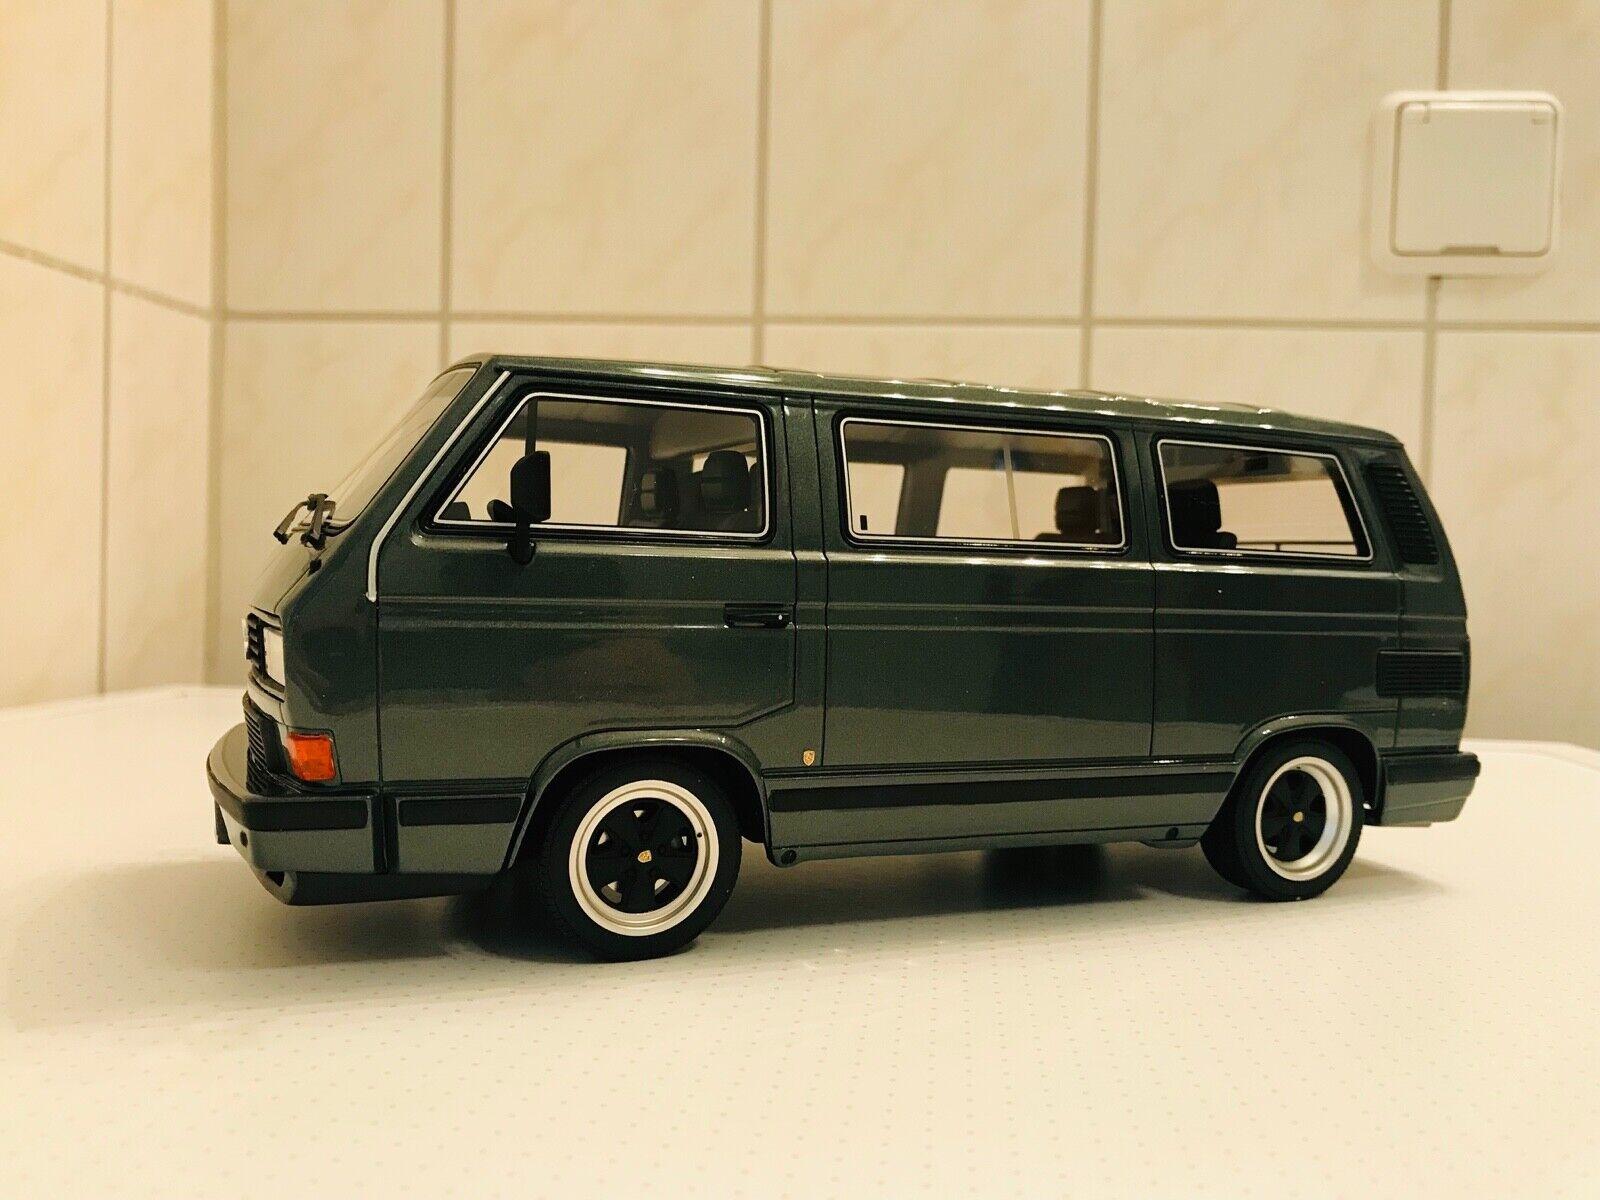 VW bus PORSCHE T3 B32 OTTO MOBILE OVP LIMITIERT 1 1500 1 18